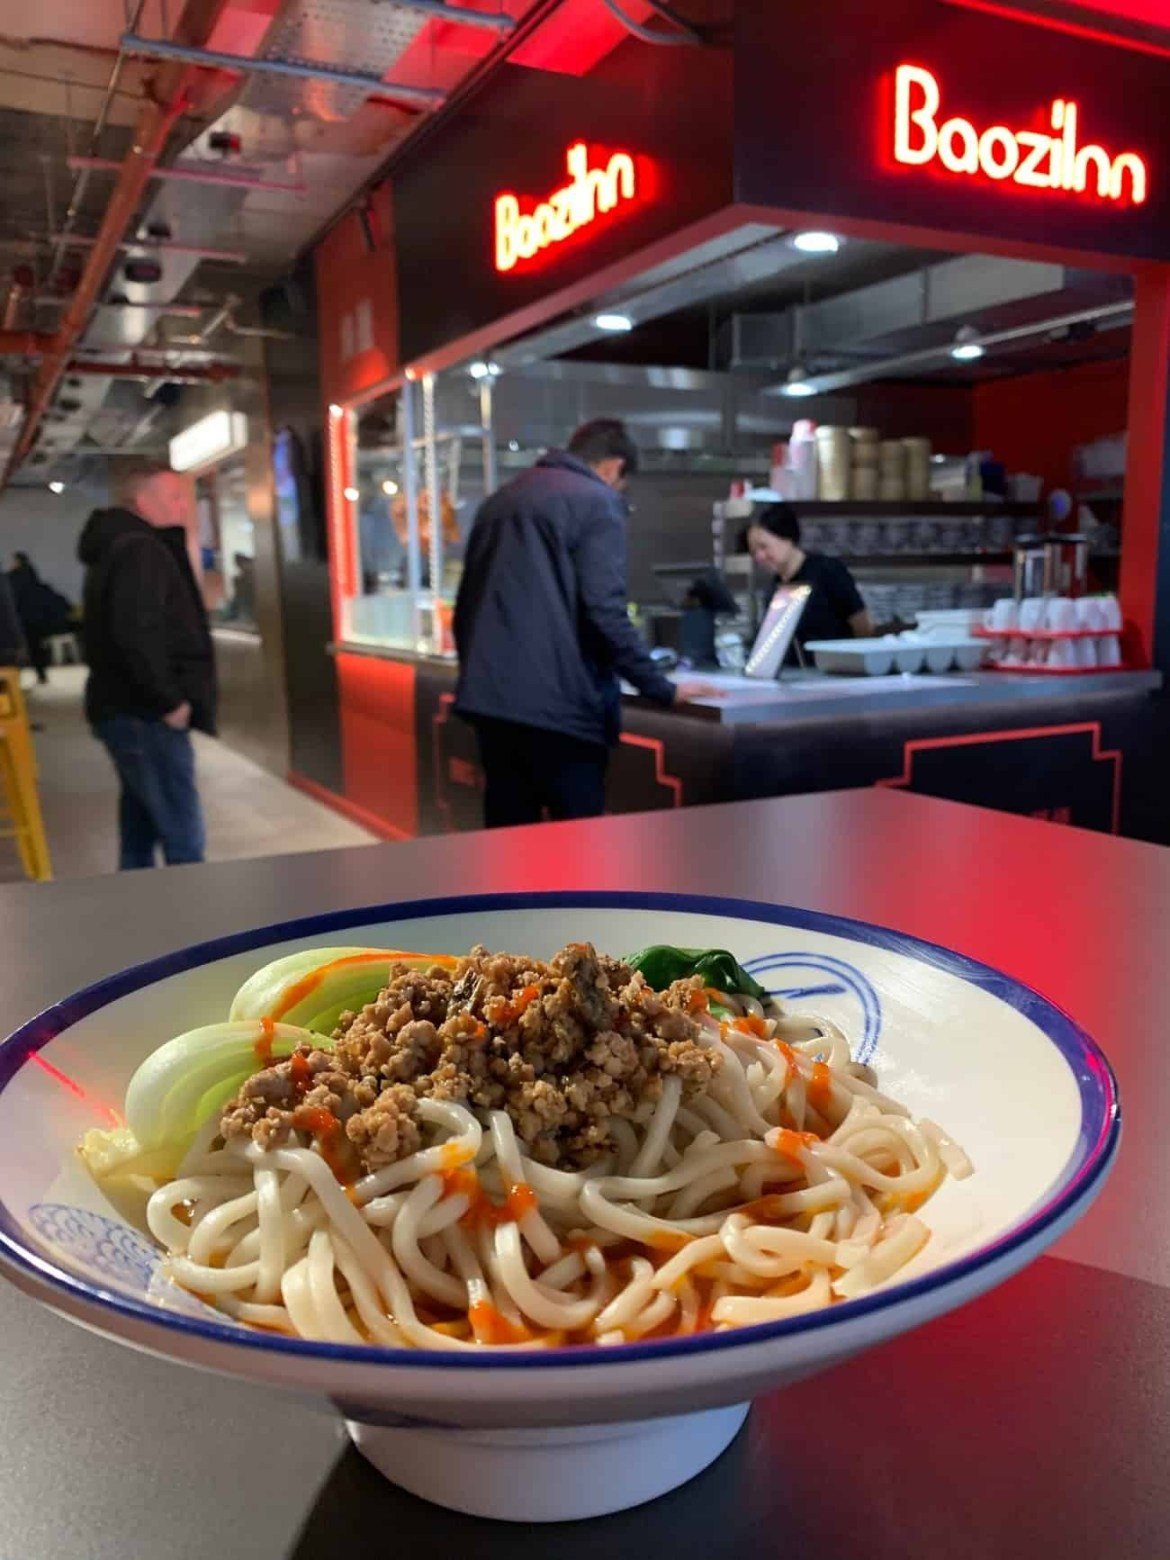 Dan Dan noodles from Baozilnn